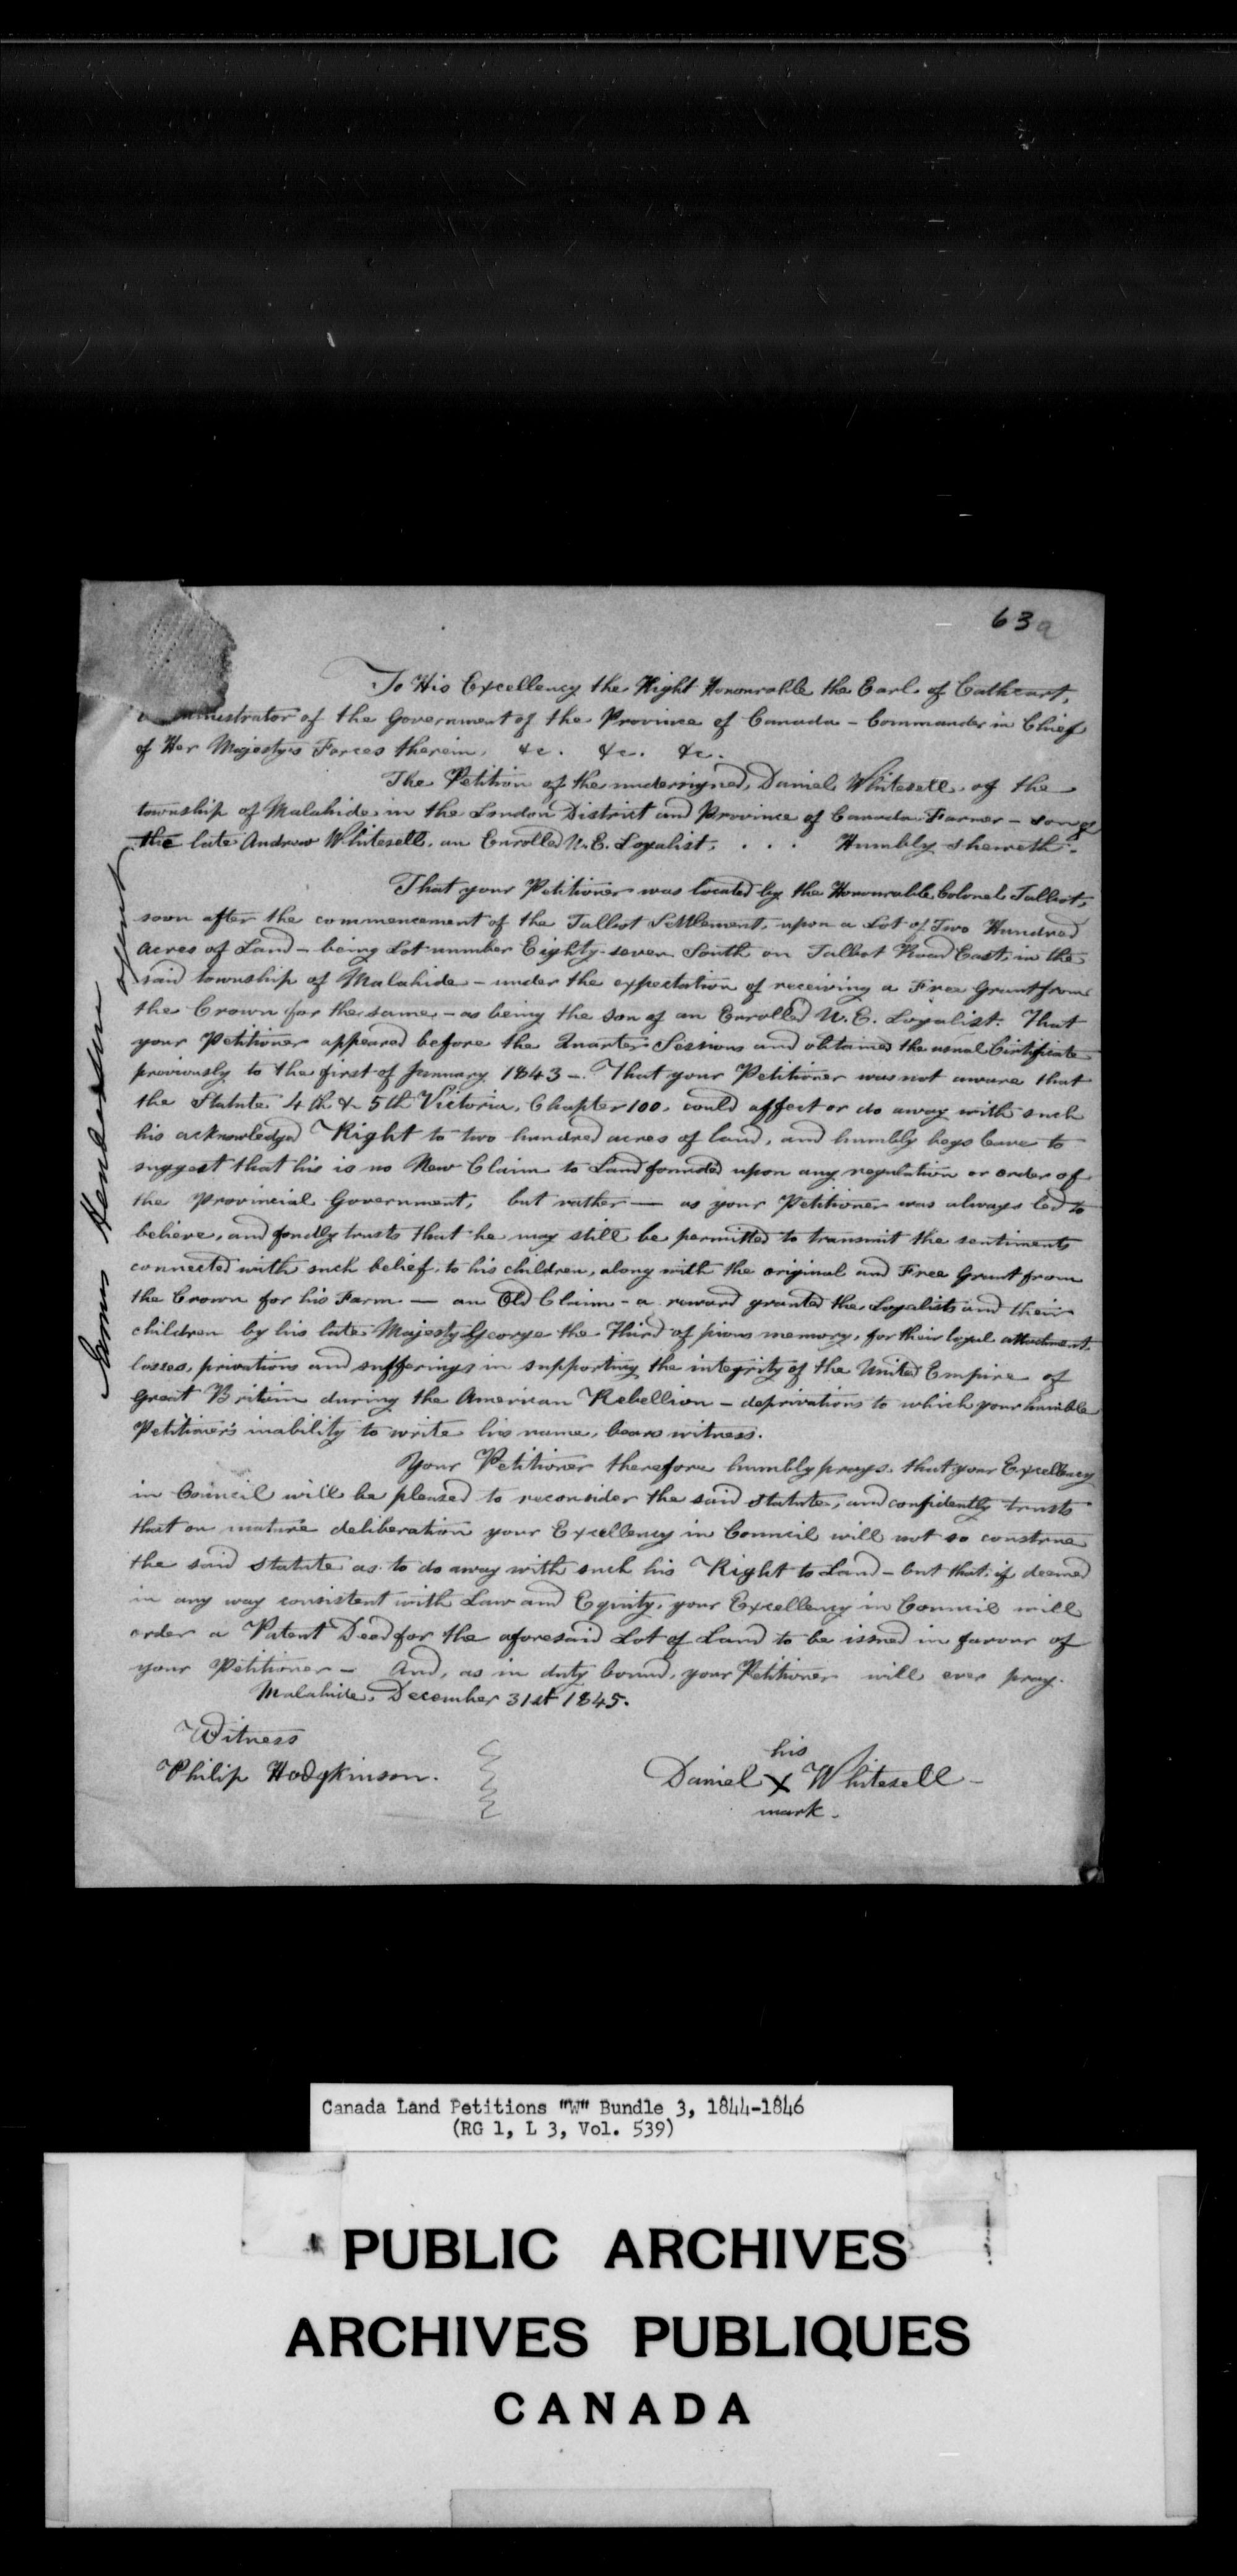 Titre: Demandes de terres du Haut-Canada (1763-1865) - N° d'enregistrement Mikan: 205131 - Microforme: c-2962